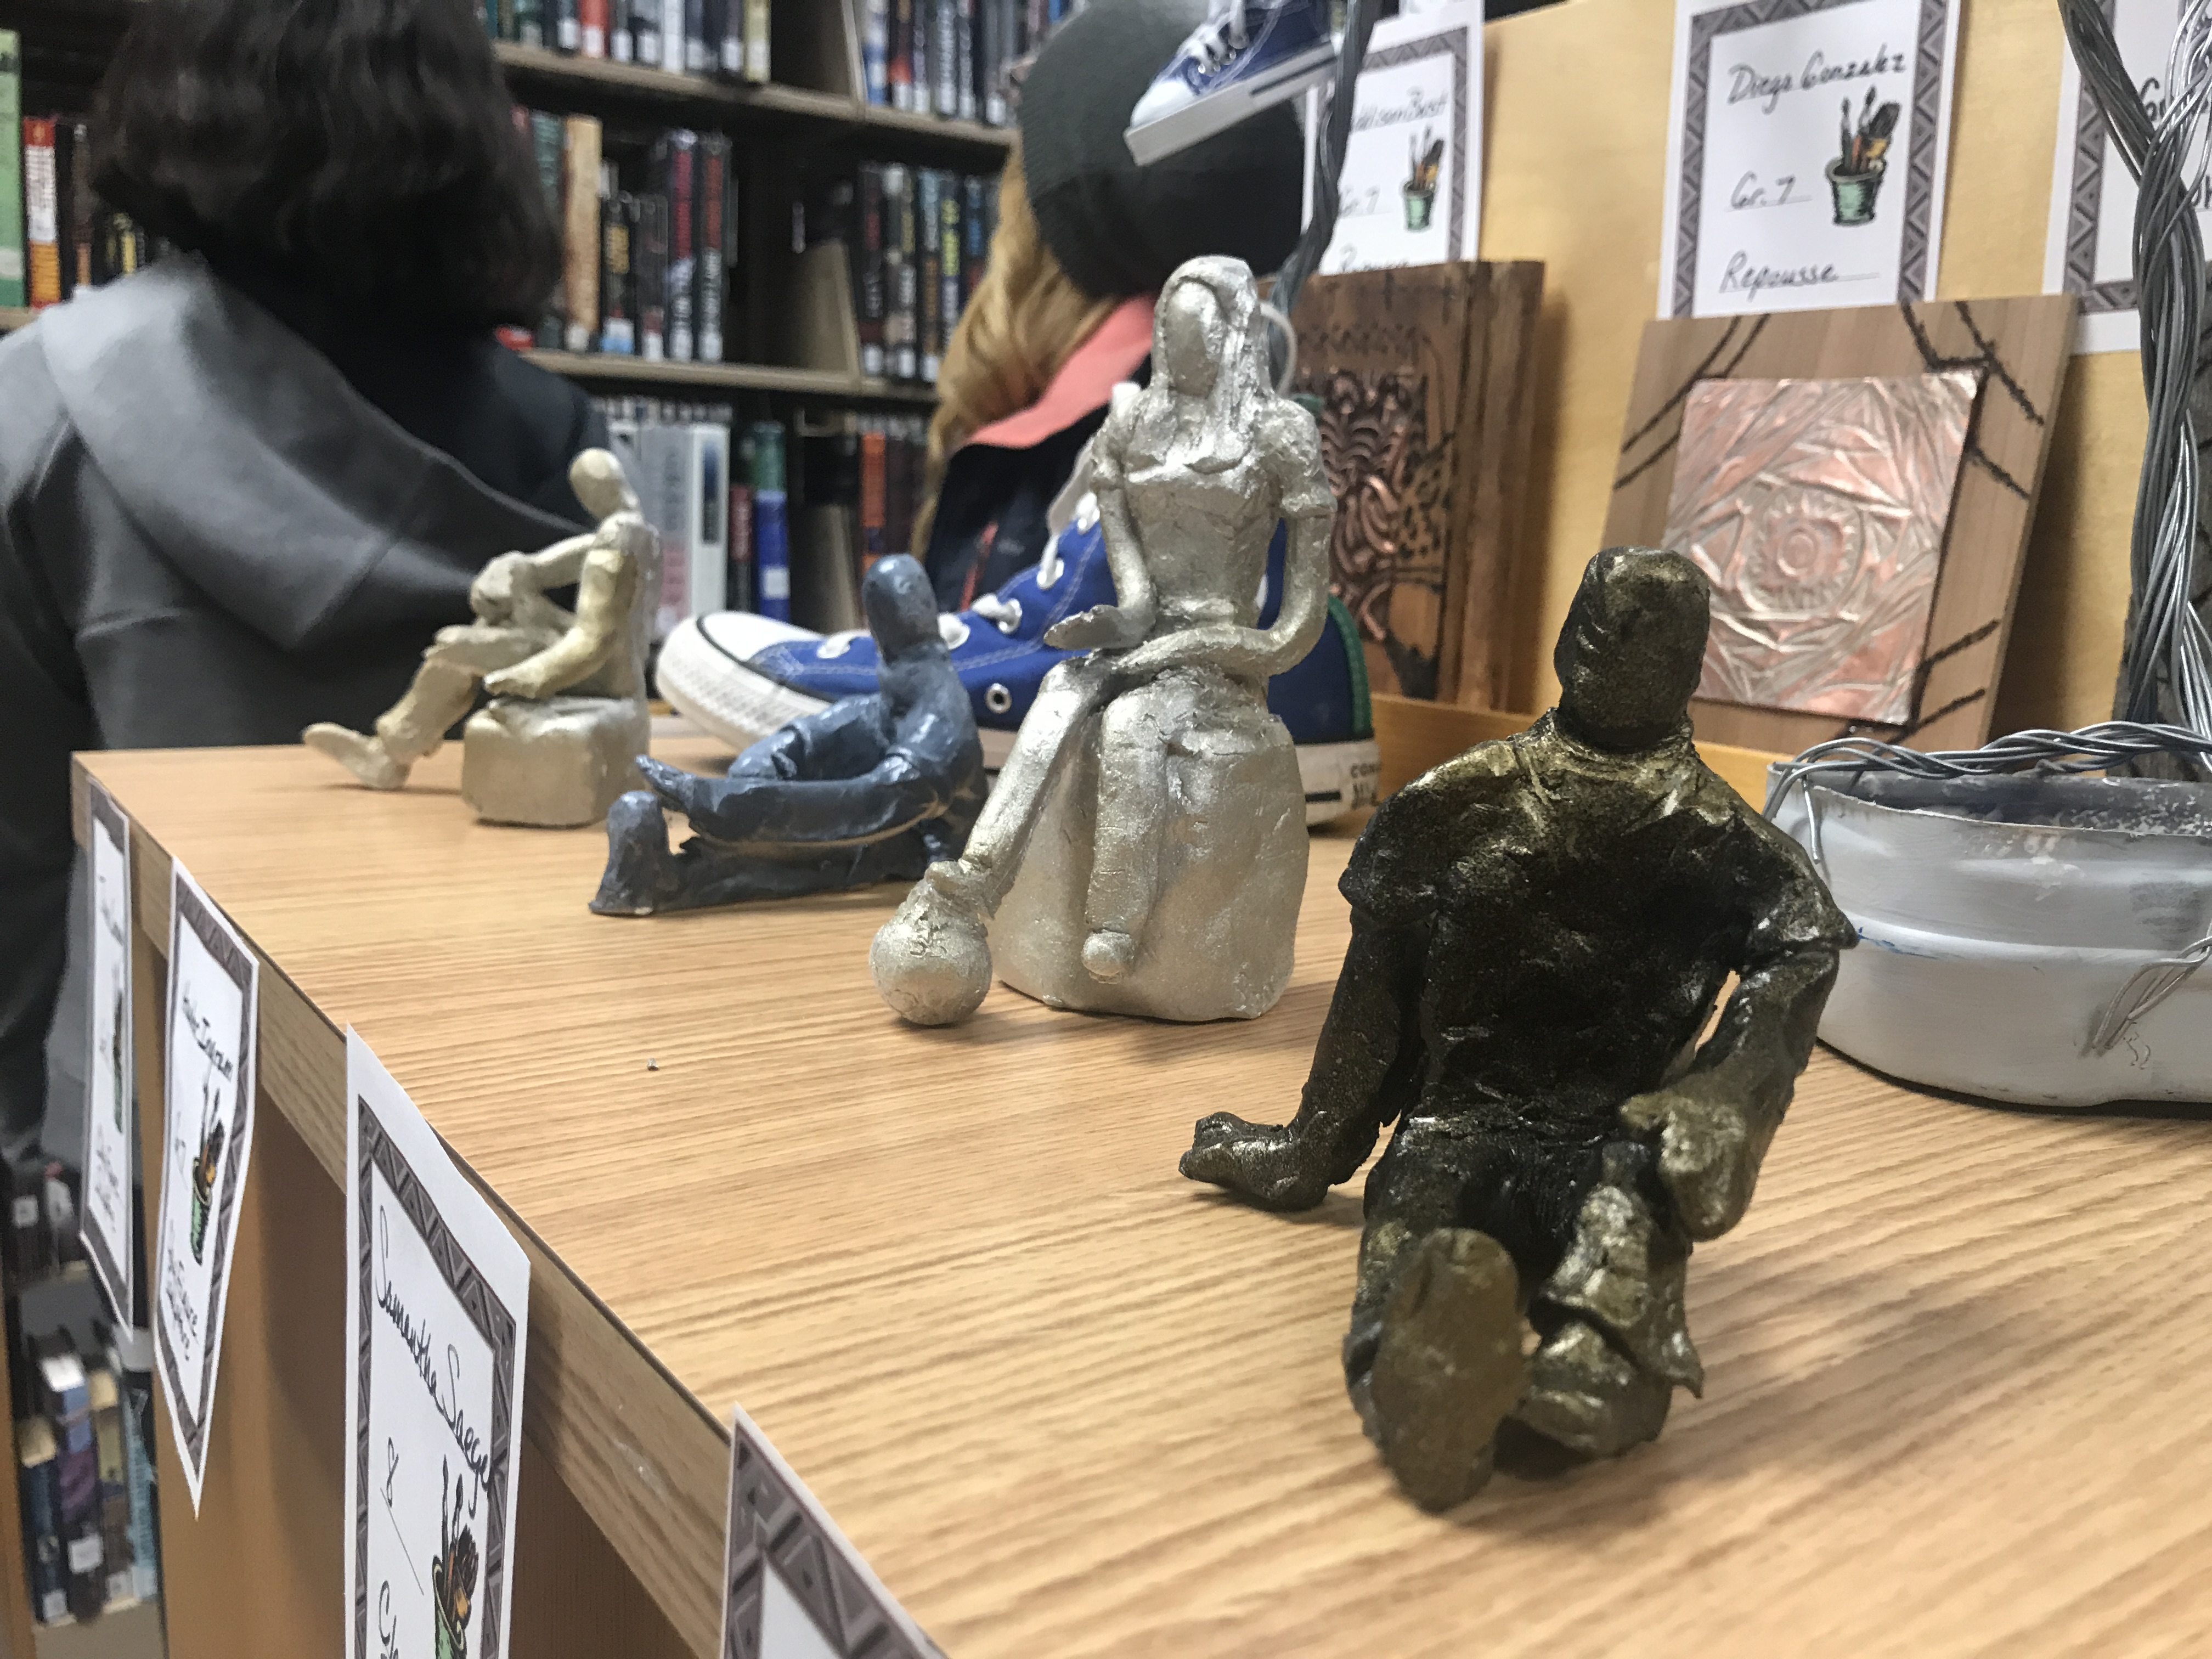 Figurines by Washington Middle School seventh-graders watch over a shelf. Warren Bluhm | NEW Media